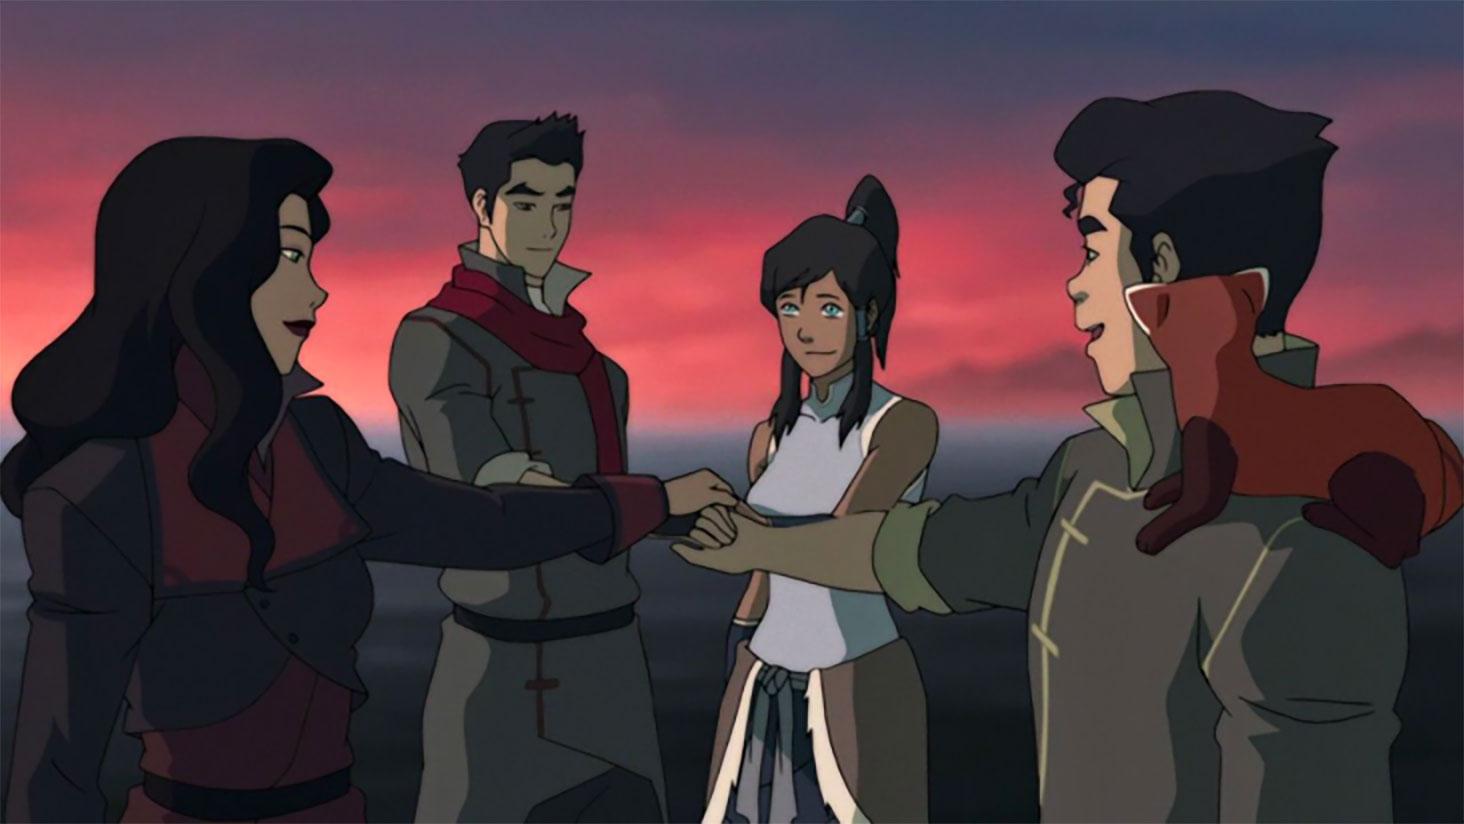 asami bolin mako and korra forming team avatar